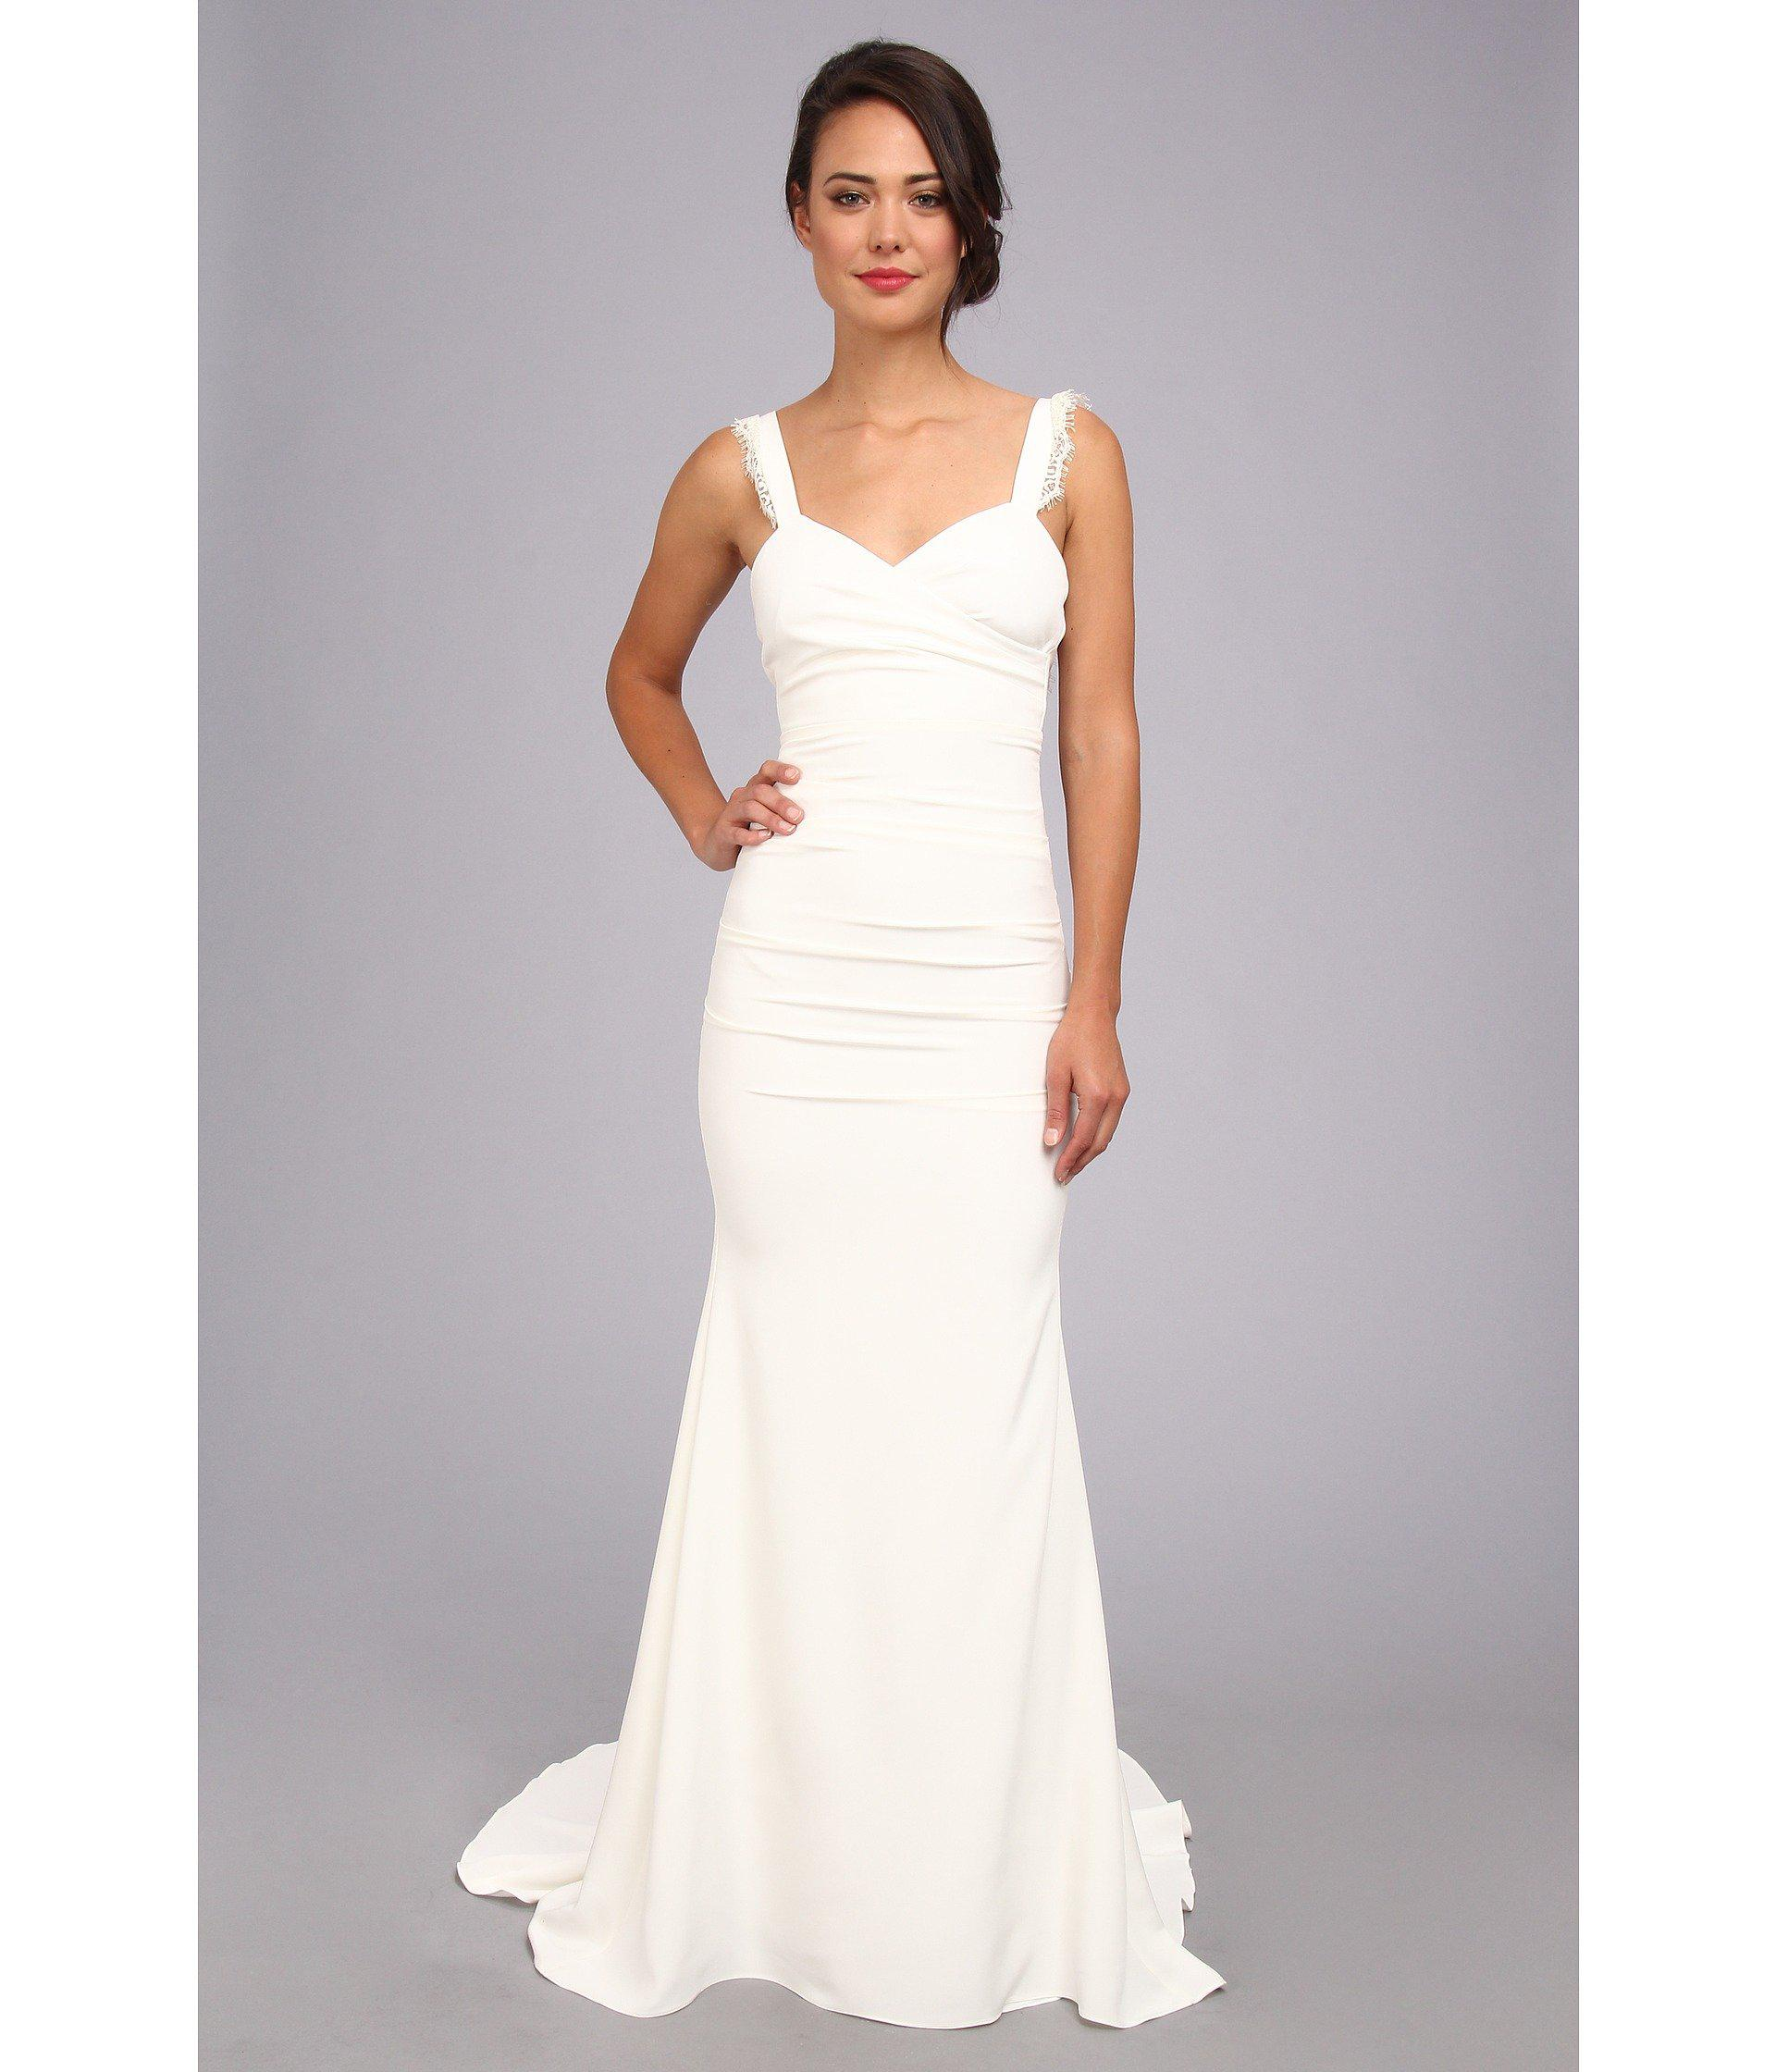 Old Fashioned Nicole Miller Dakota Bridal Gown Ornament - Top ...